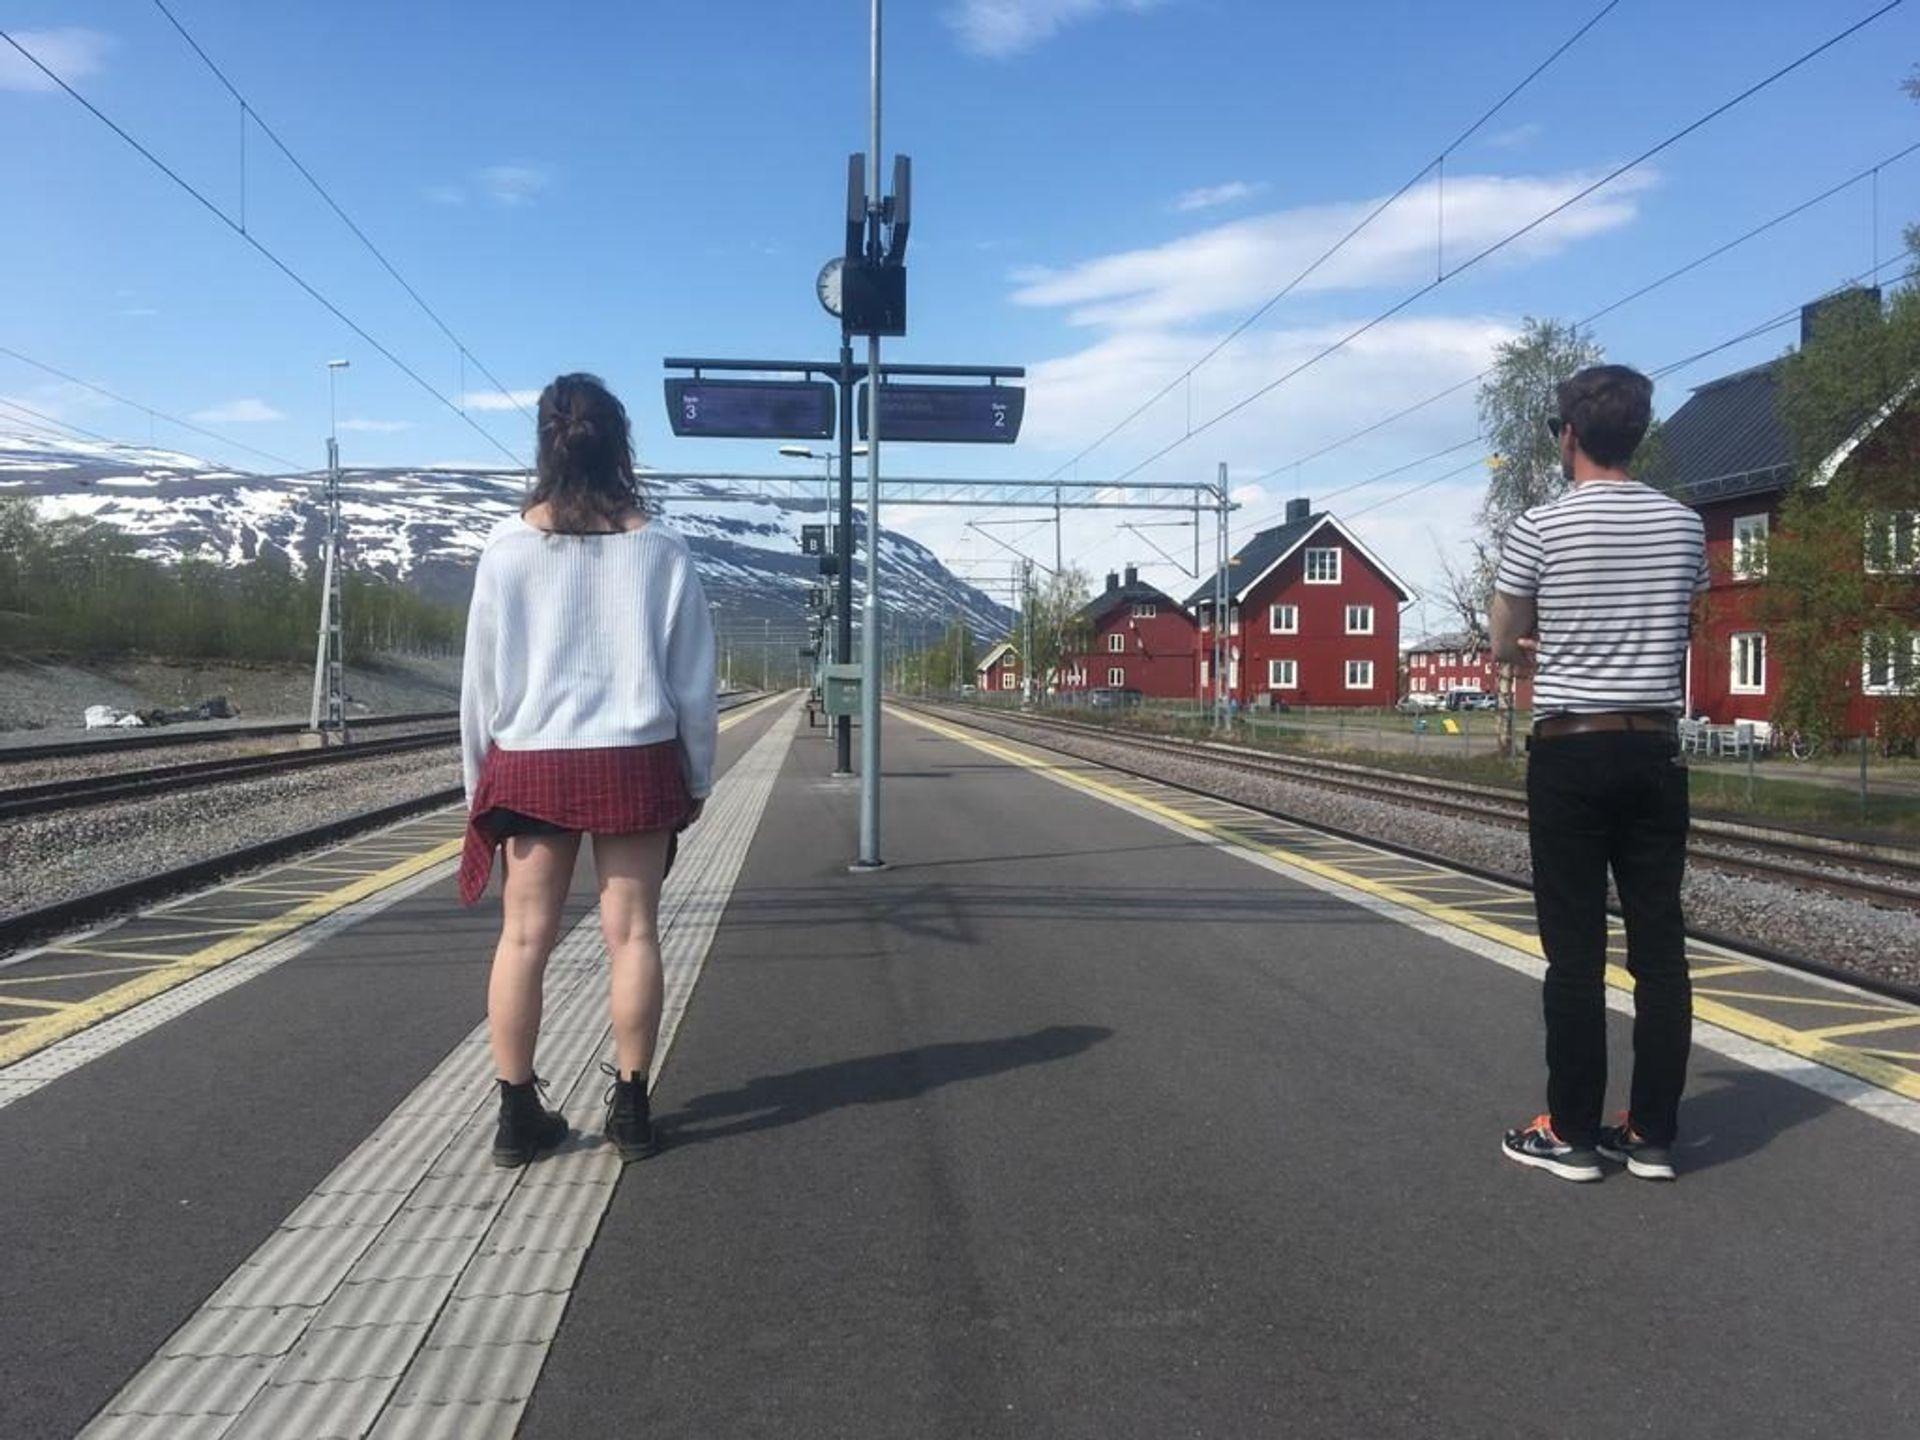 Friends waiting for a train in Abisko / Photo Credit: Nicolas